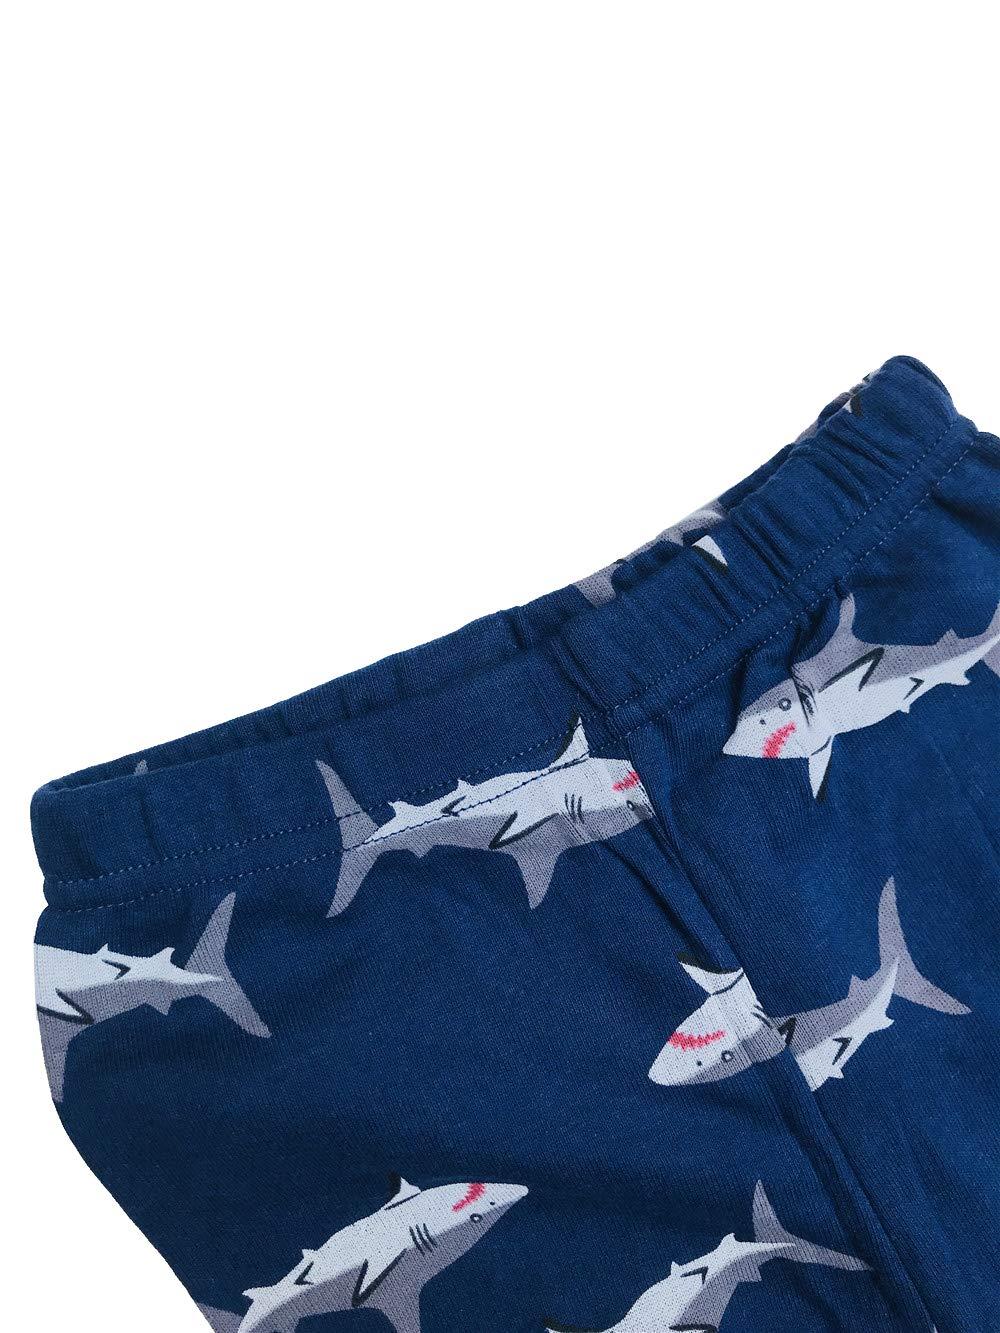 Little Boy Pajamas for Boys Pajamas Kids Shark Nightwear Sleepwear Long Sleeve Pyjamas Pjs Set Size 2-3 Years 3T Christmas Thanksgiving Gifts Chirstmas Thanksgiving Gray